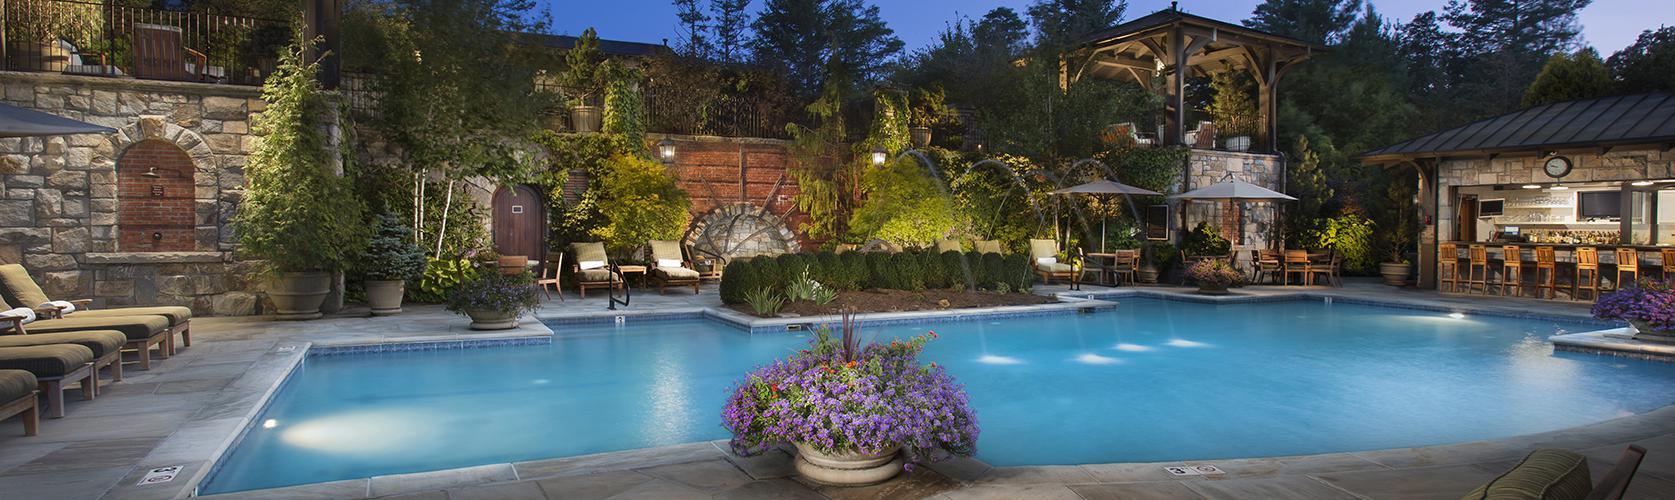 old-edwards-inn-spa-pool-highlands-nc.jpg